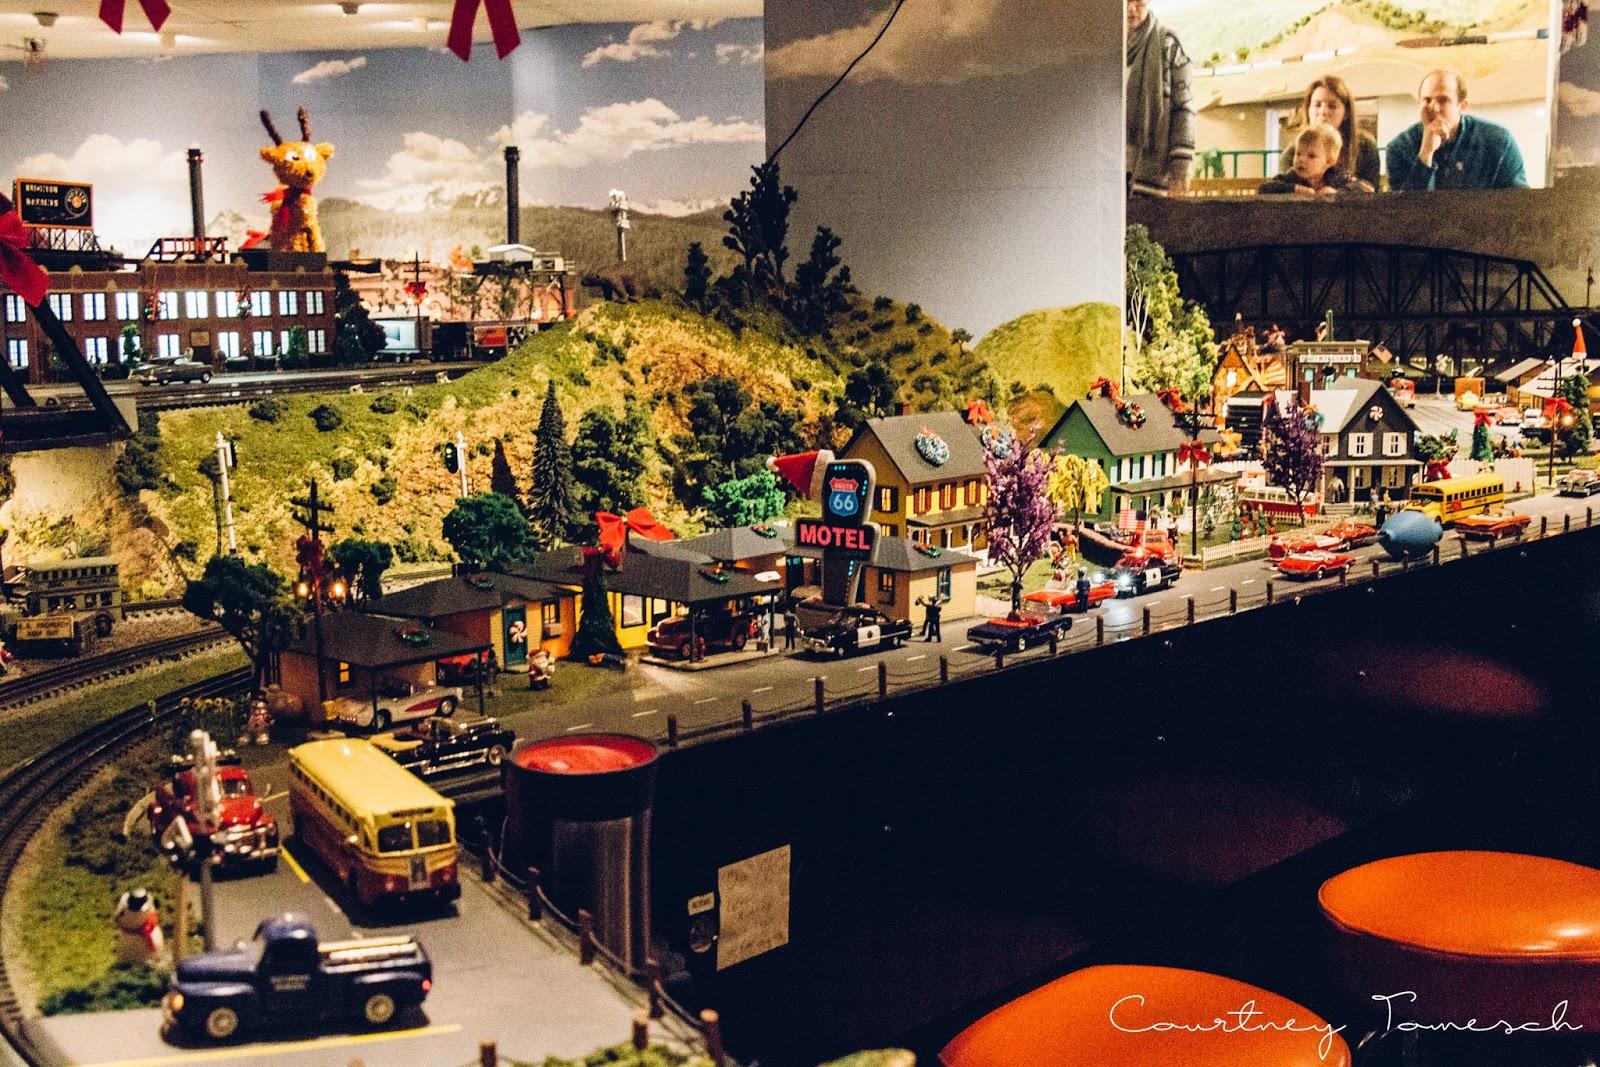 Courtney Tomesch Balboa Park December Nights San Diego Model Railroad Museum